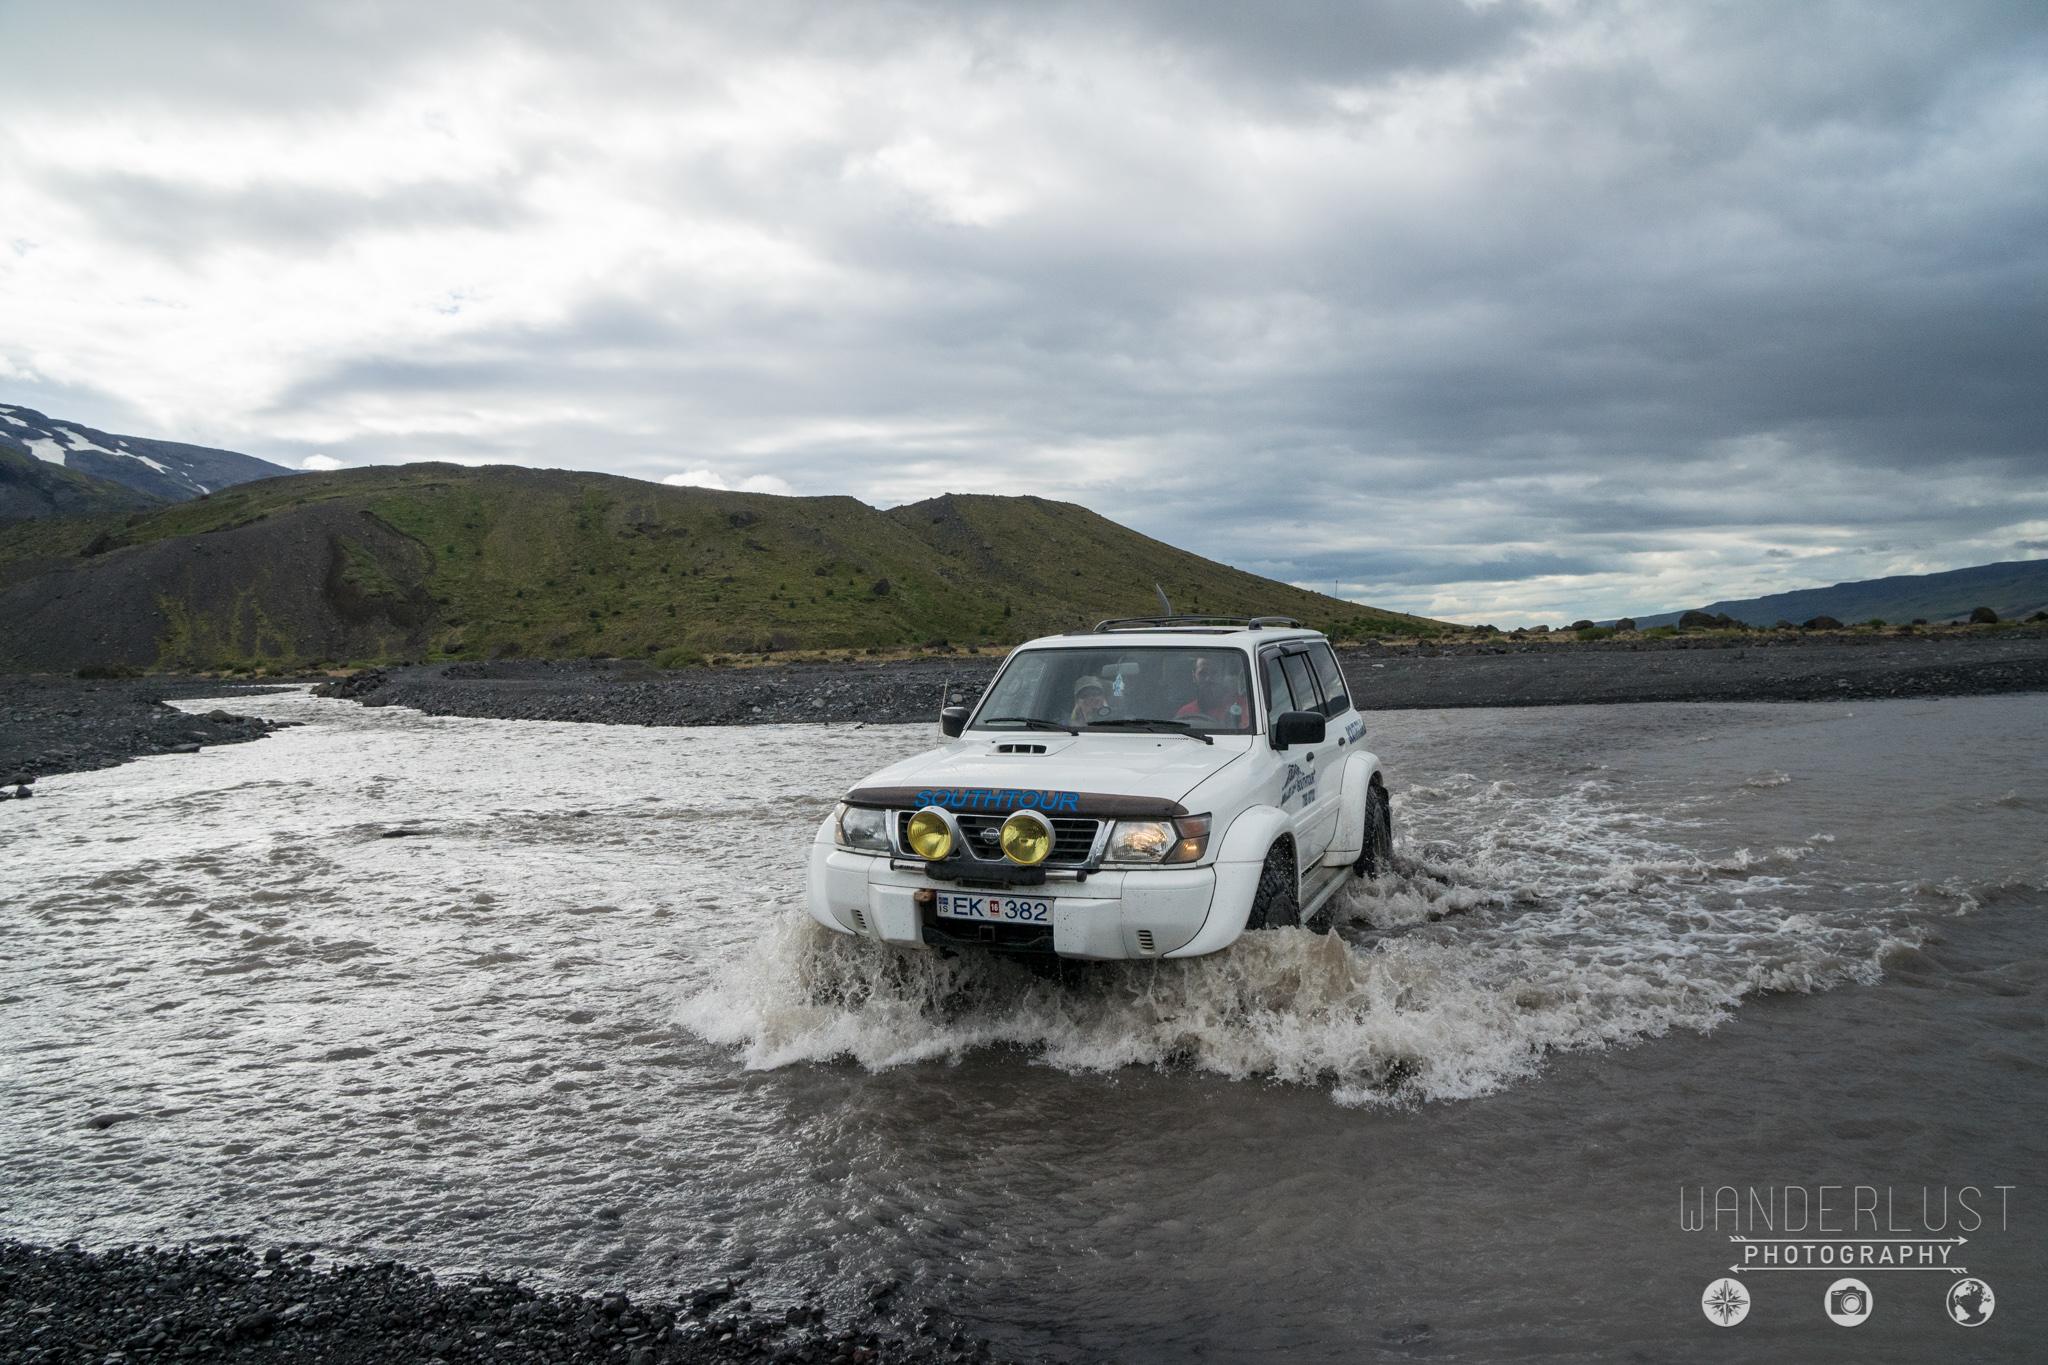 Iceland-07022.jpg